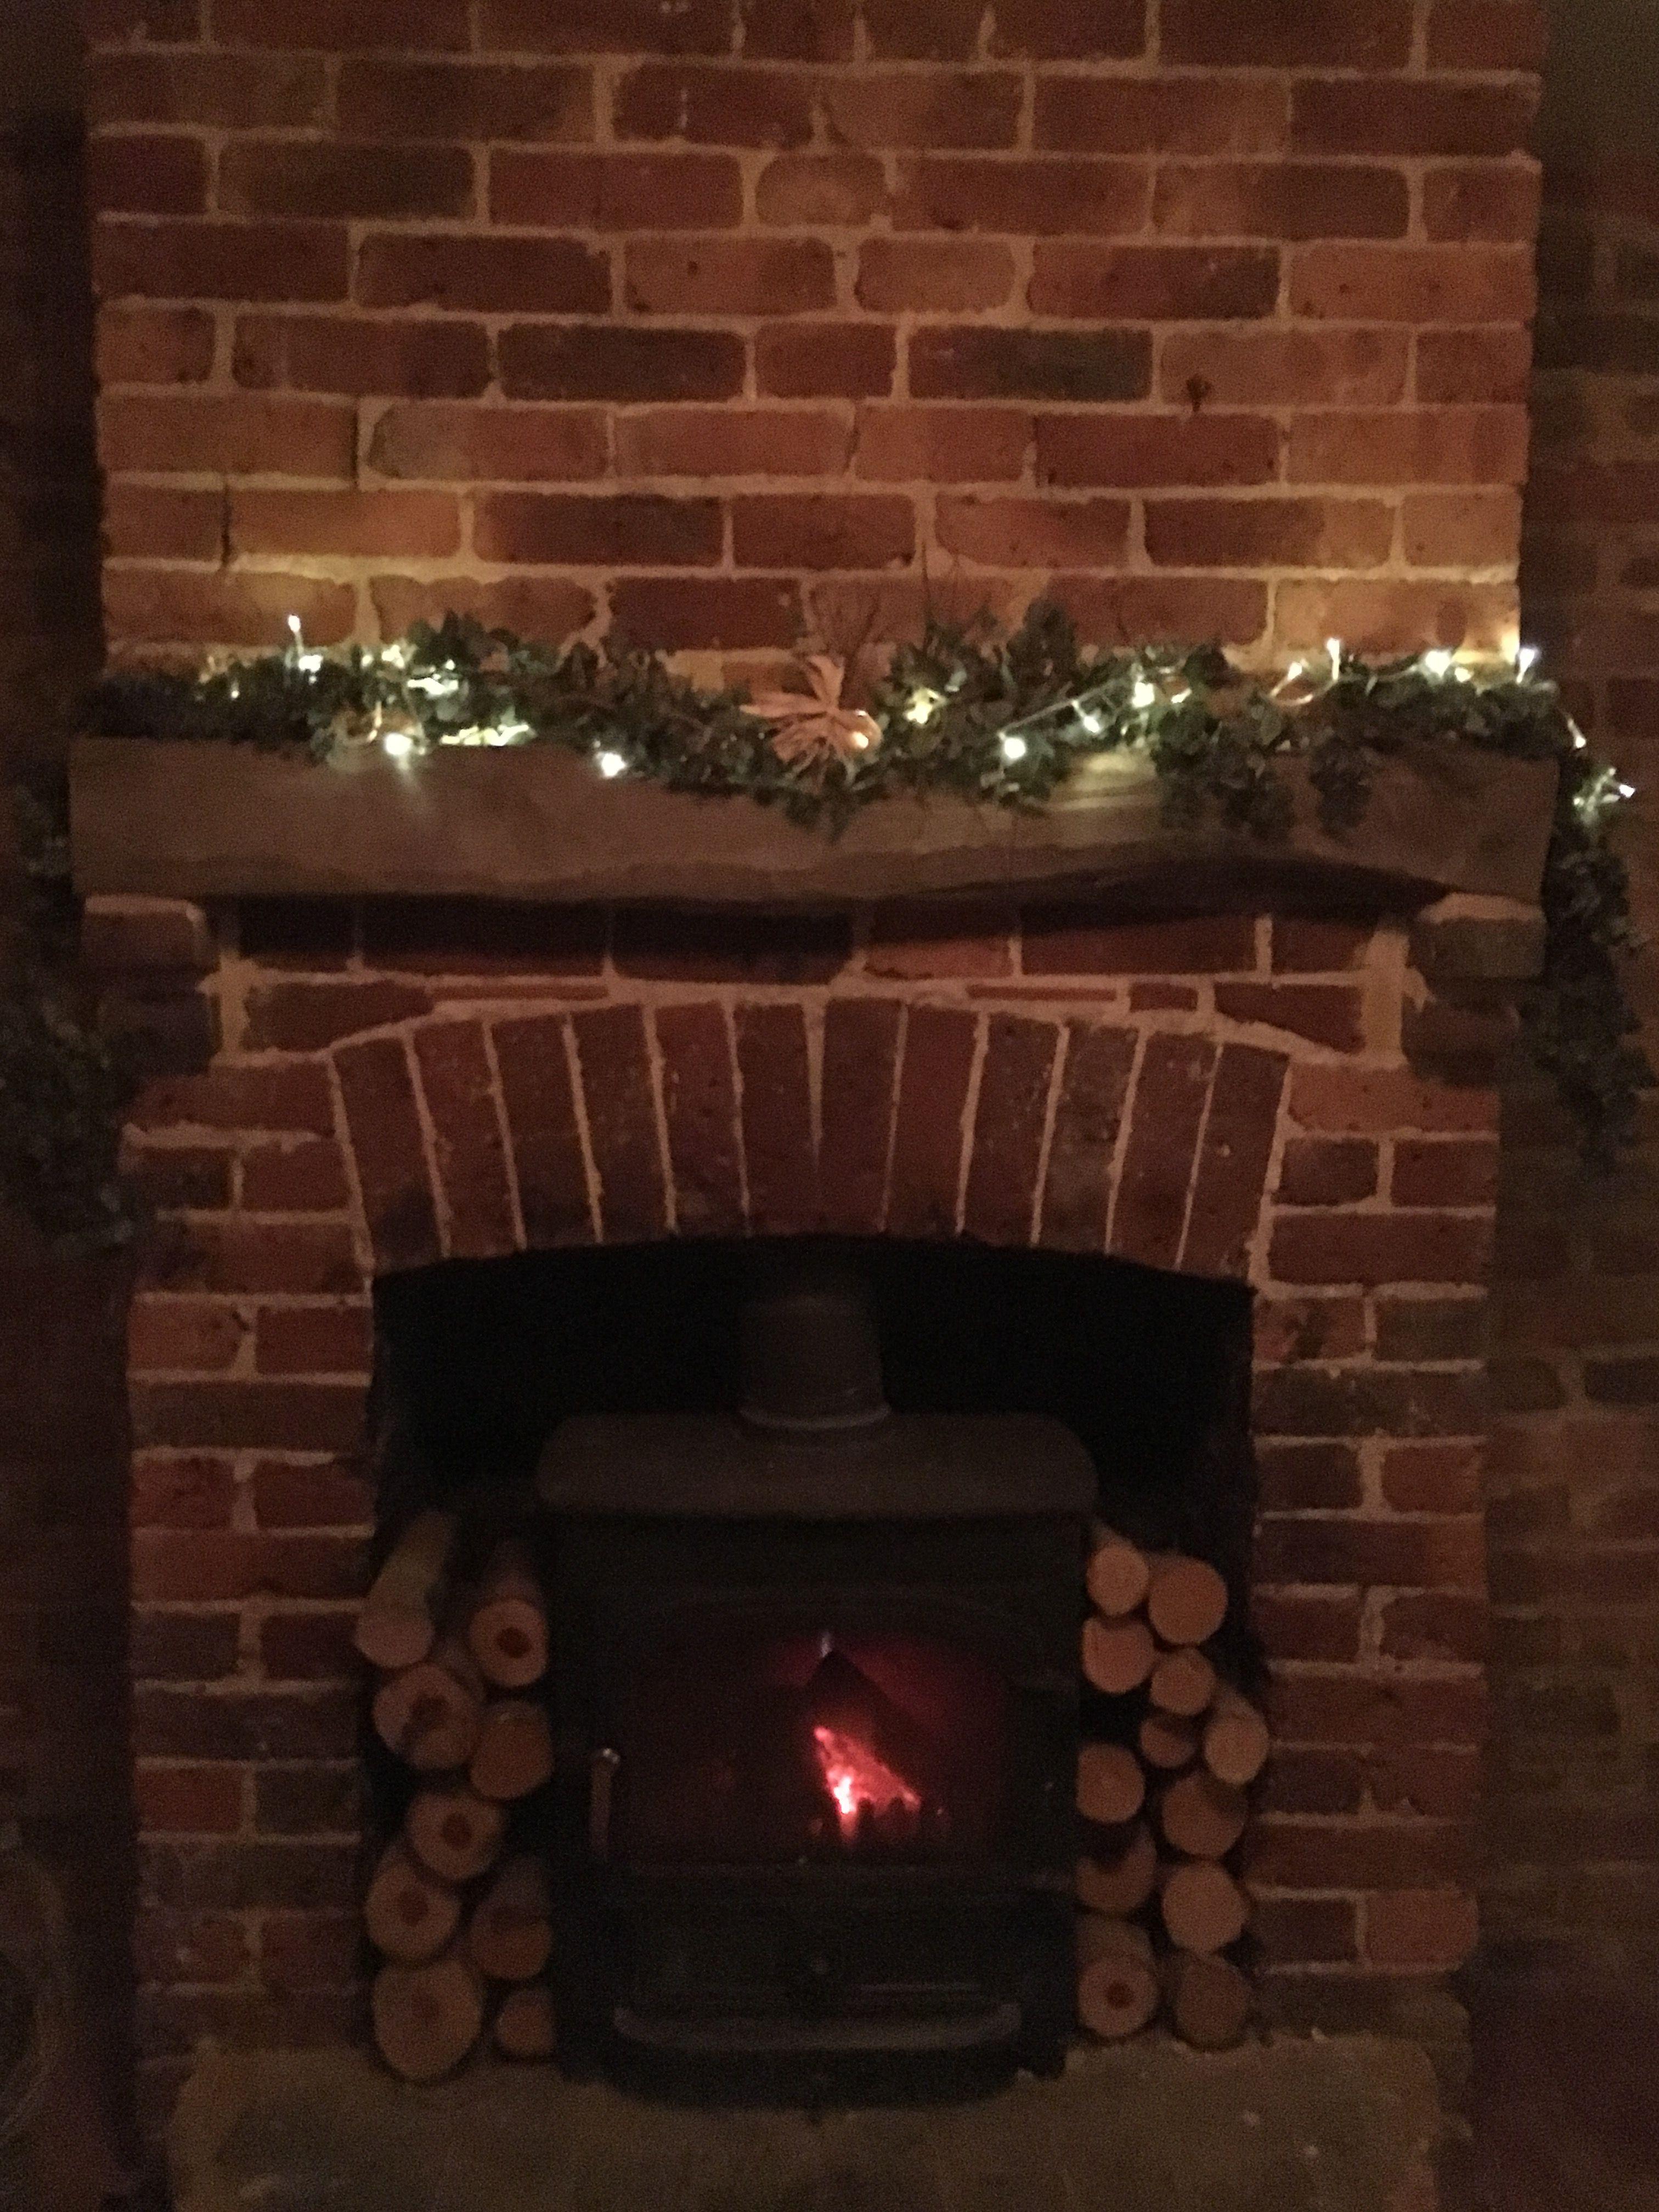 100 Year Old Fireplace Original Bricks And Lime Mortar Beam